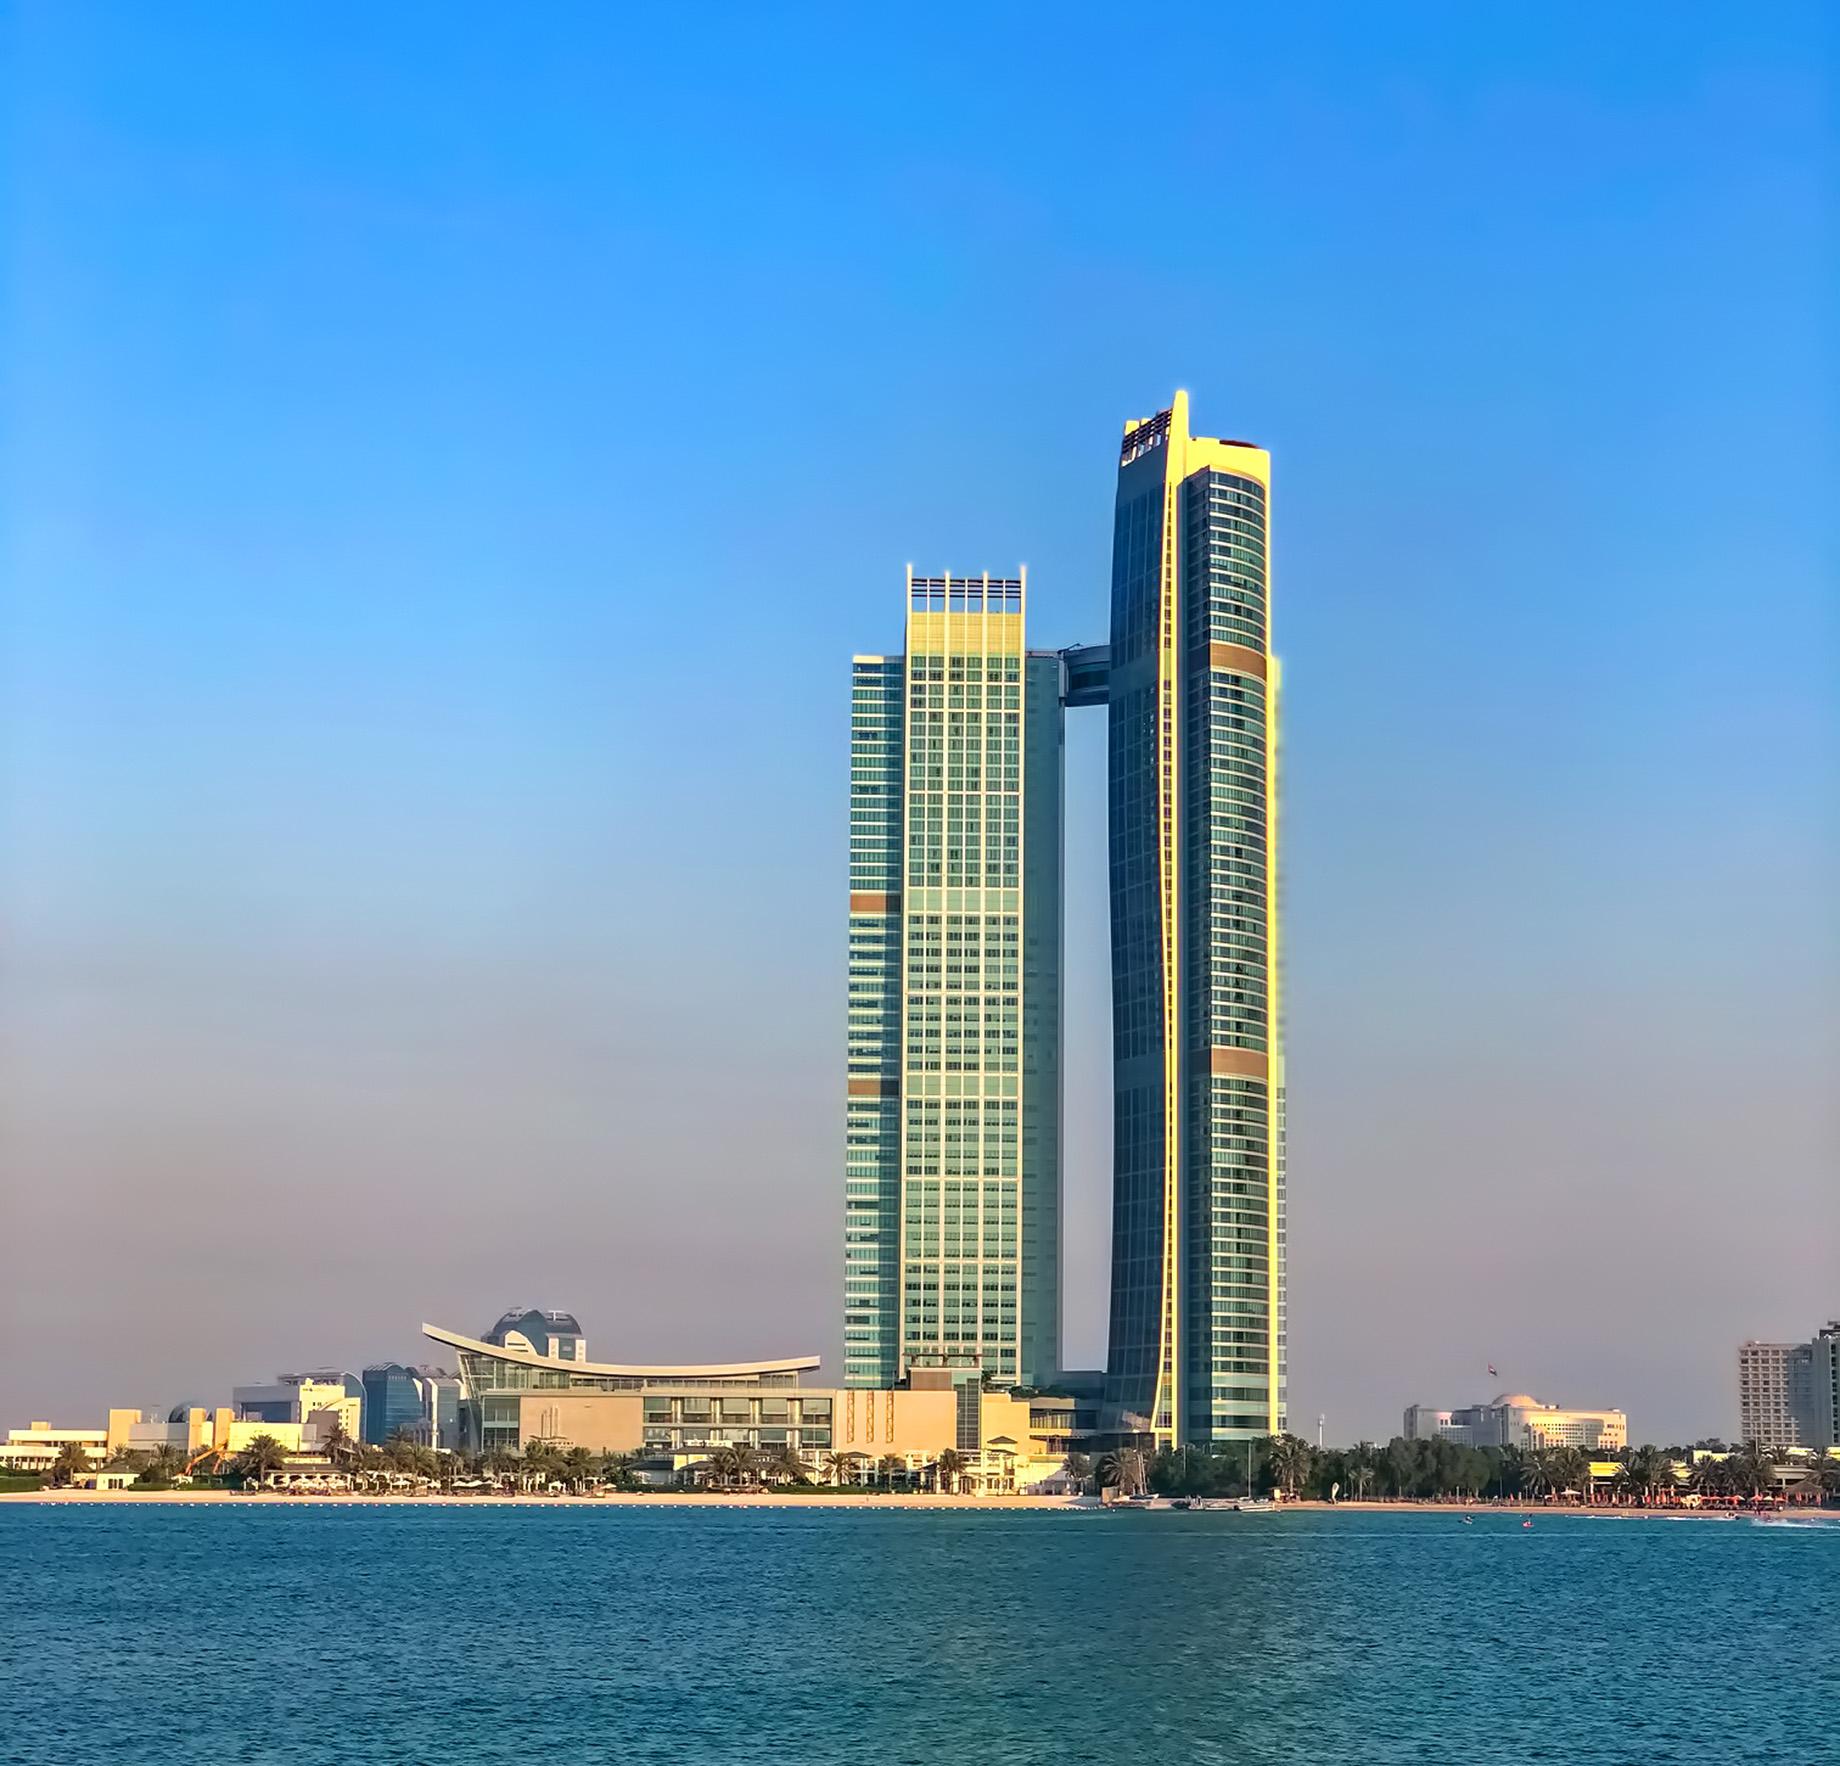 The St. Regis Abu Dhabi Luxury Hotel - Abu Dhabi, United Arab Emirates